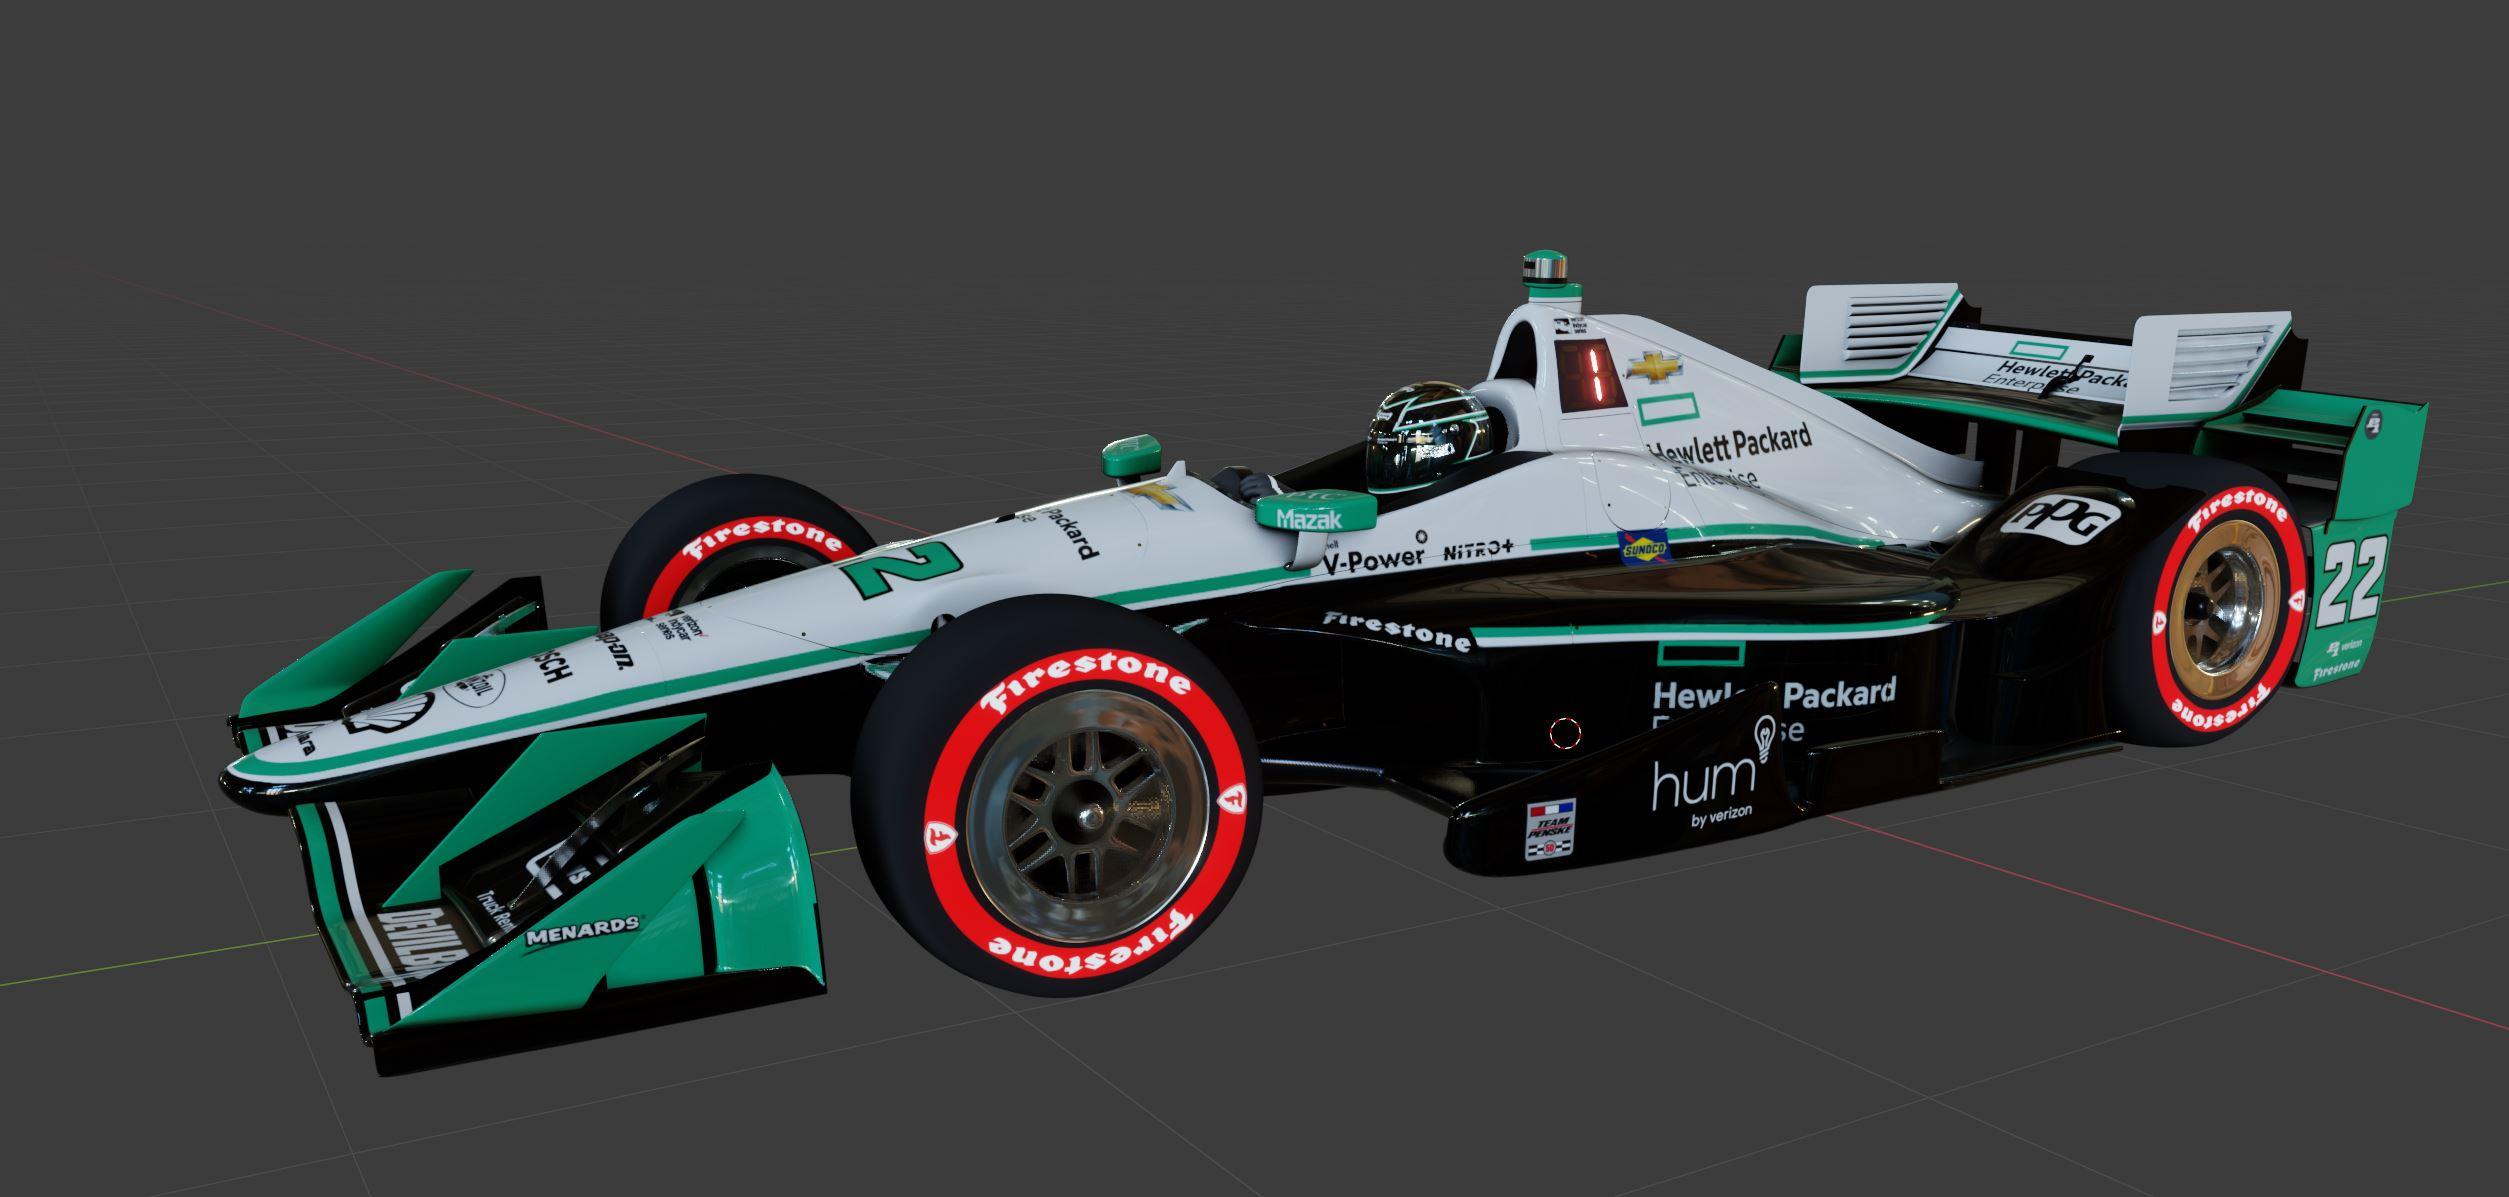 Indycar Dallara DW12 Aerokit